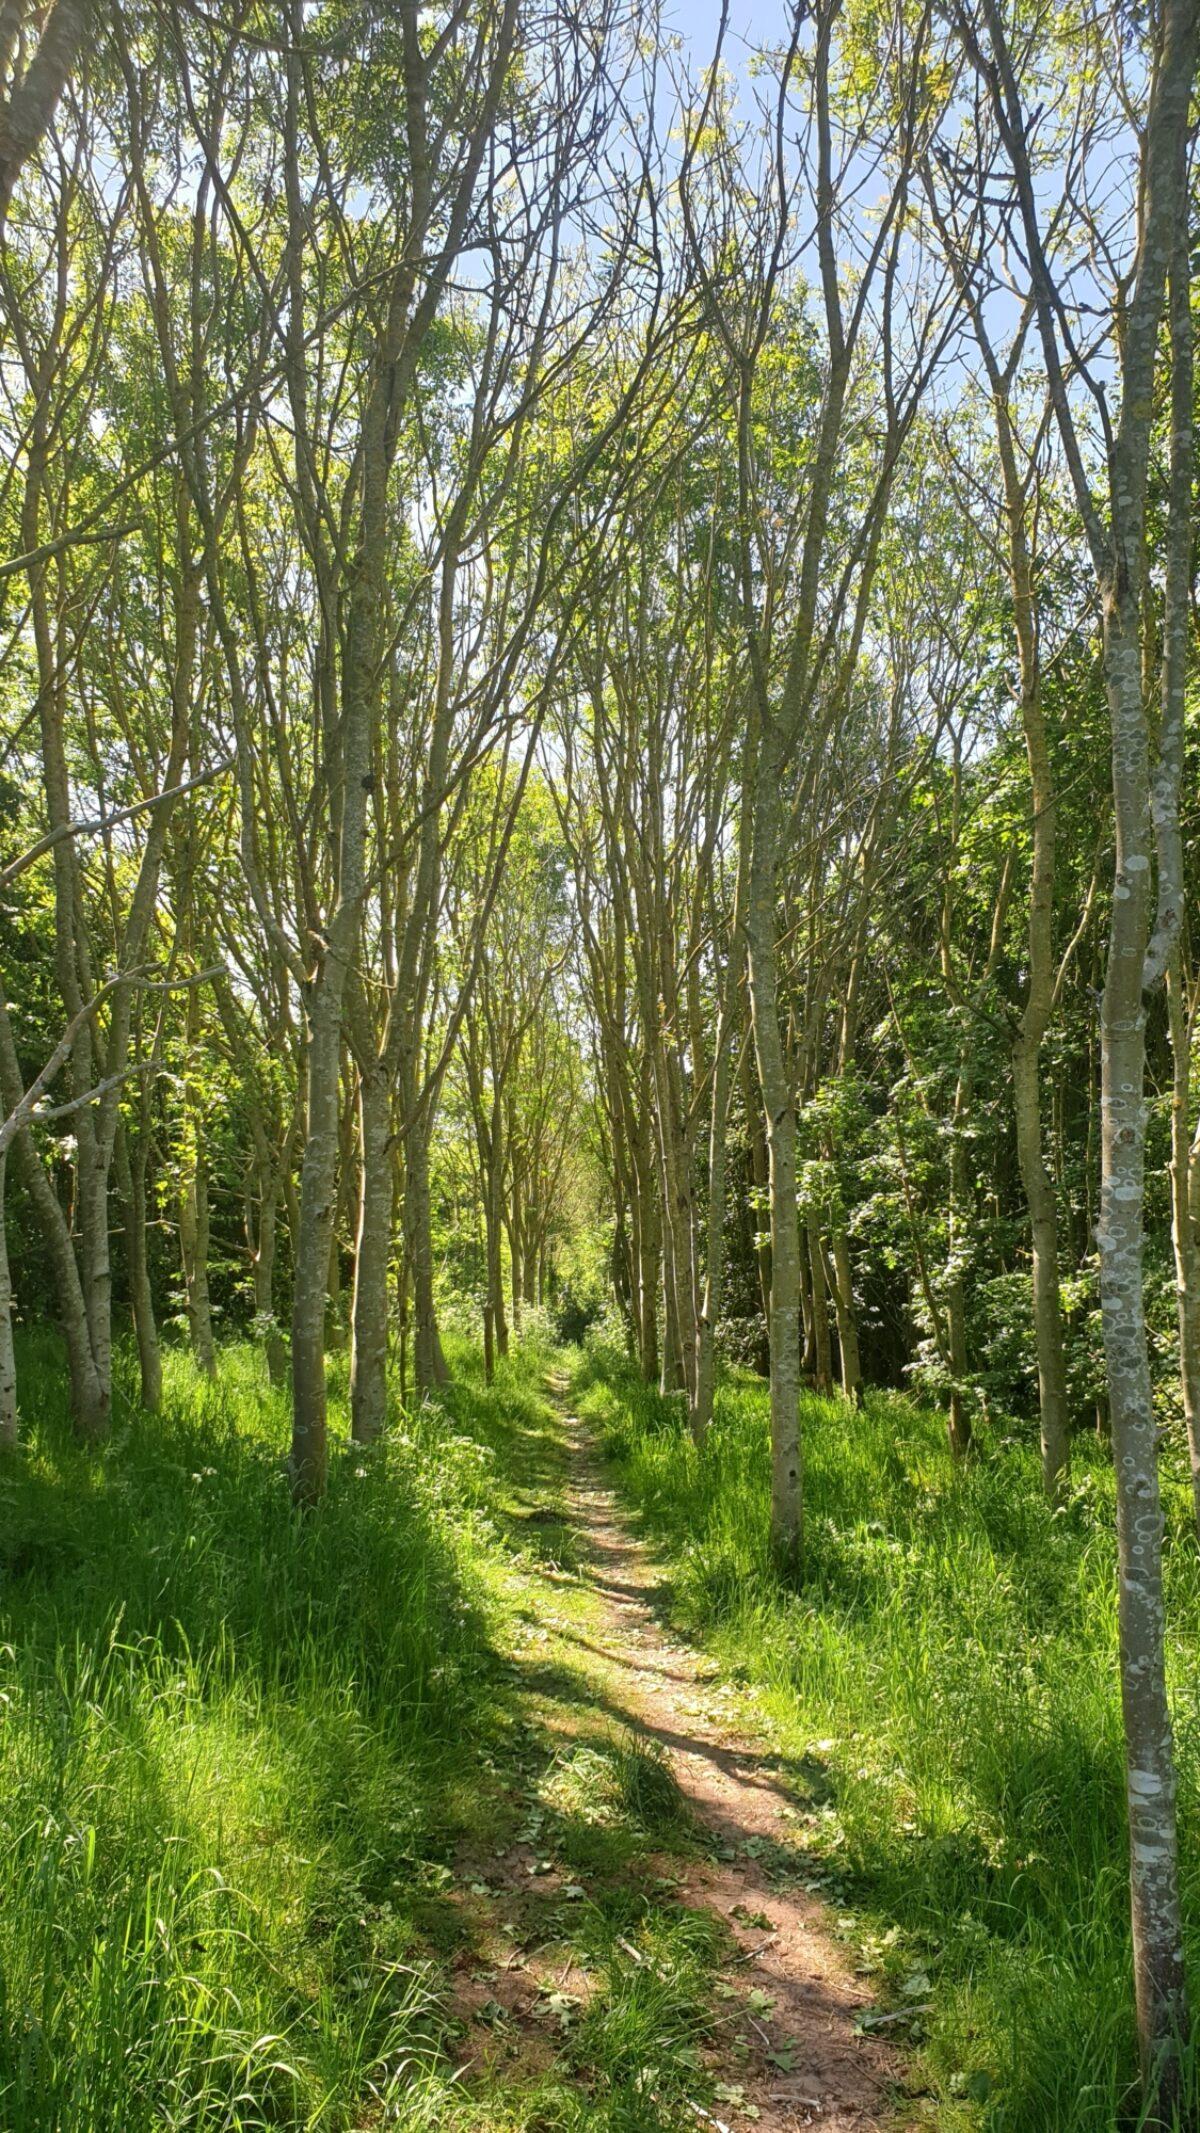 Bagworth Heath Woods large photo 3